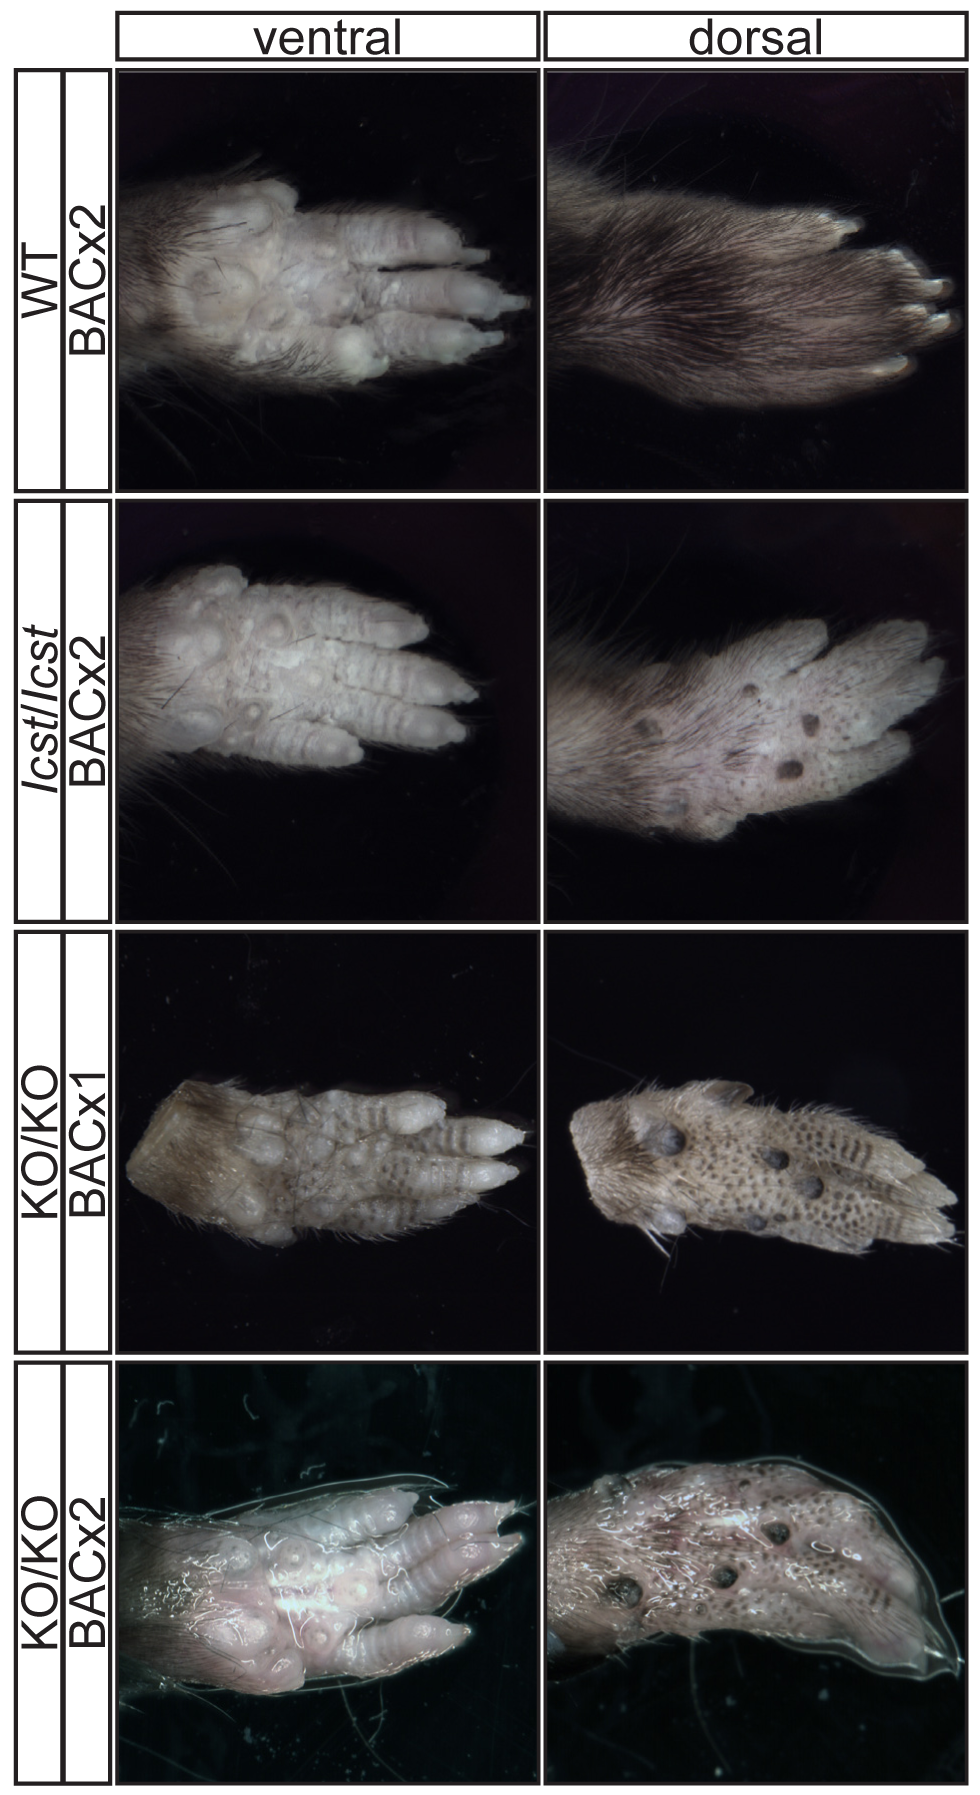 Forepaw phenotype of transgenic rescue mice.